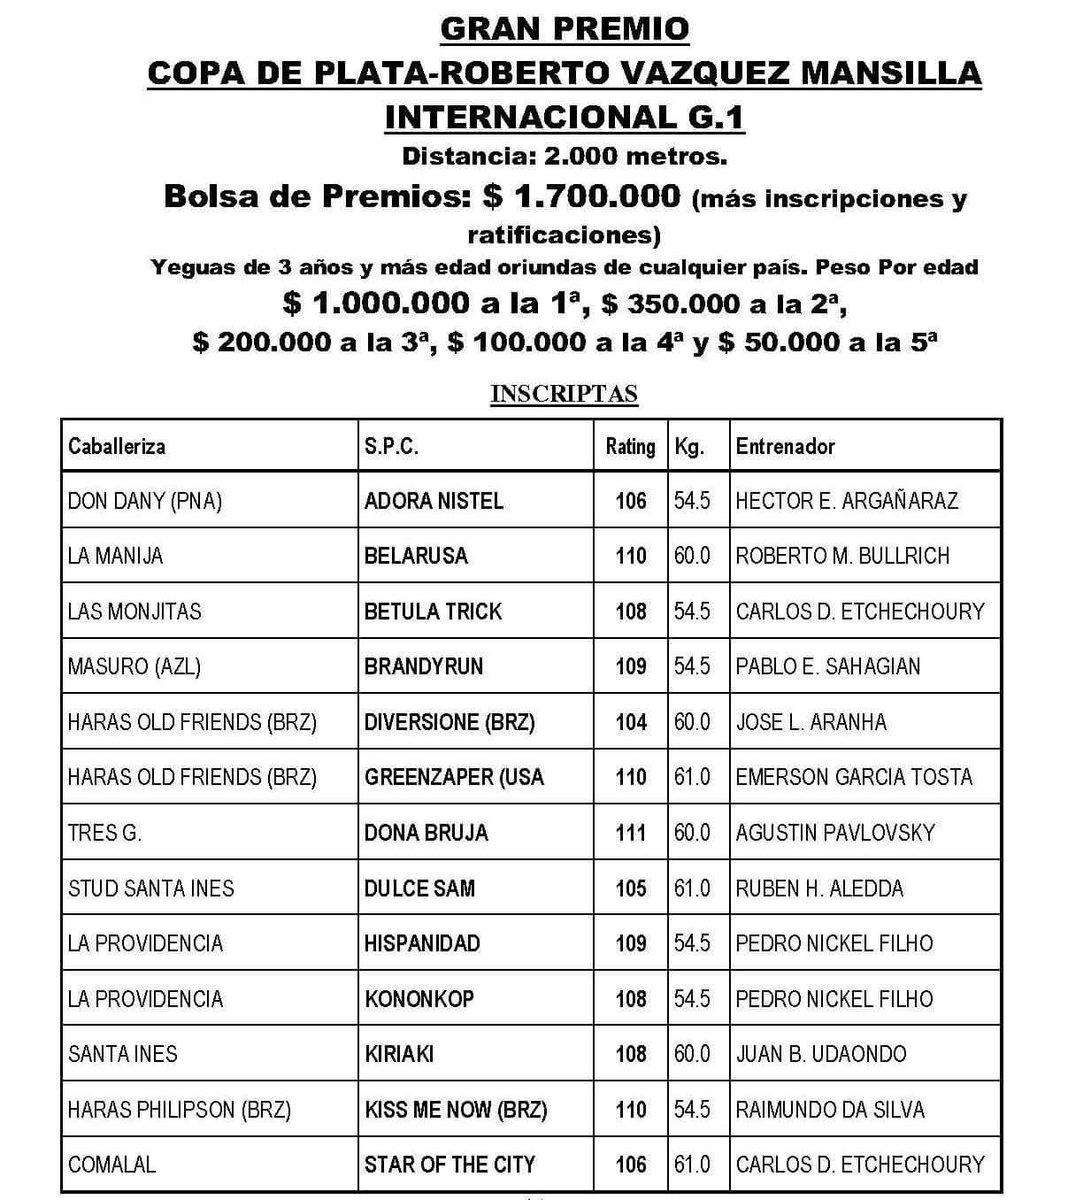 GRAN PREMIO INTERNACIONAL COPA DE PLATA (G1) 2016 CxzrqvLWIAI7LIk